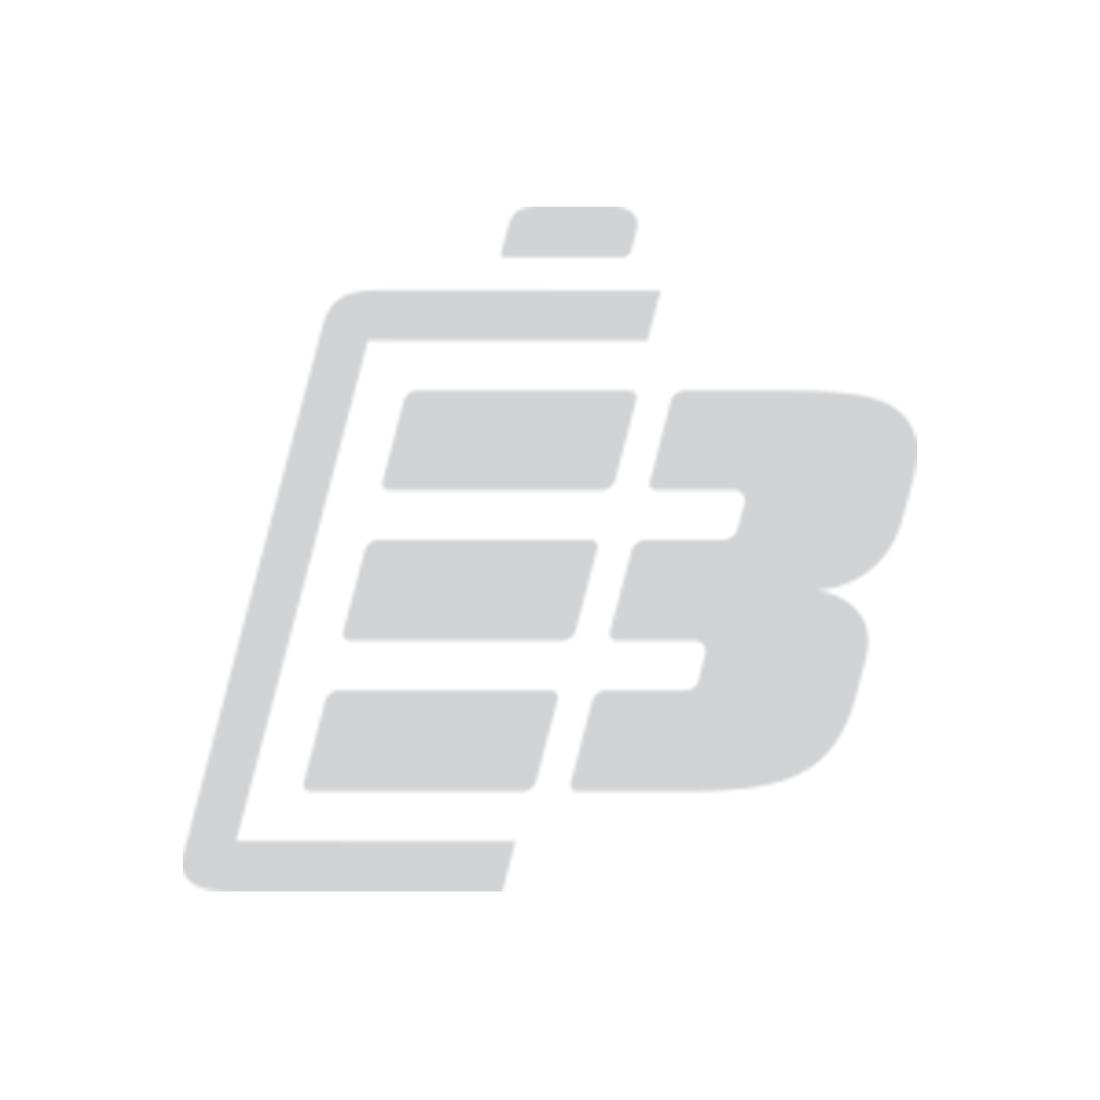 Two-Way radio battery Icom BP-221 _1